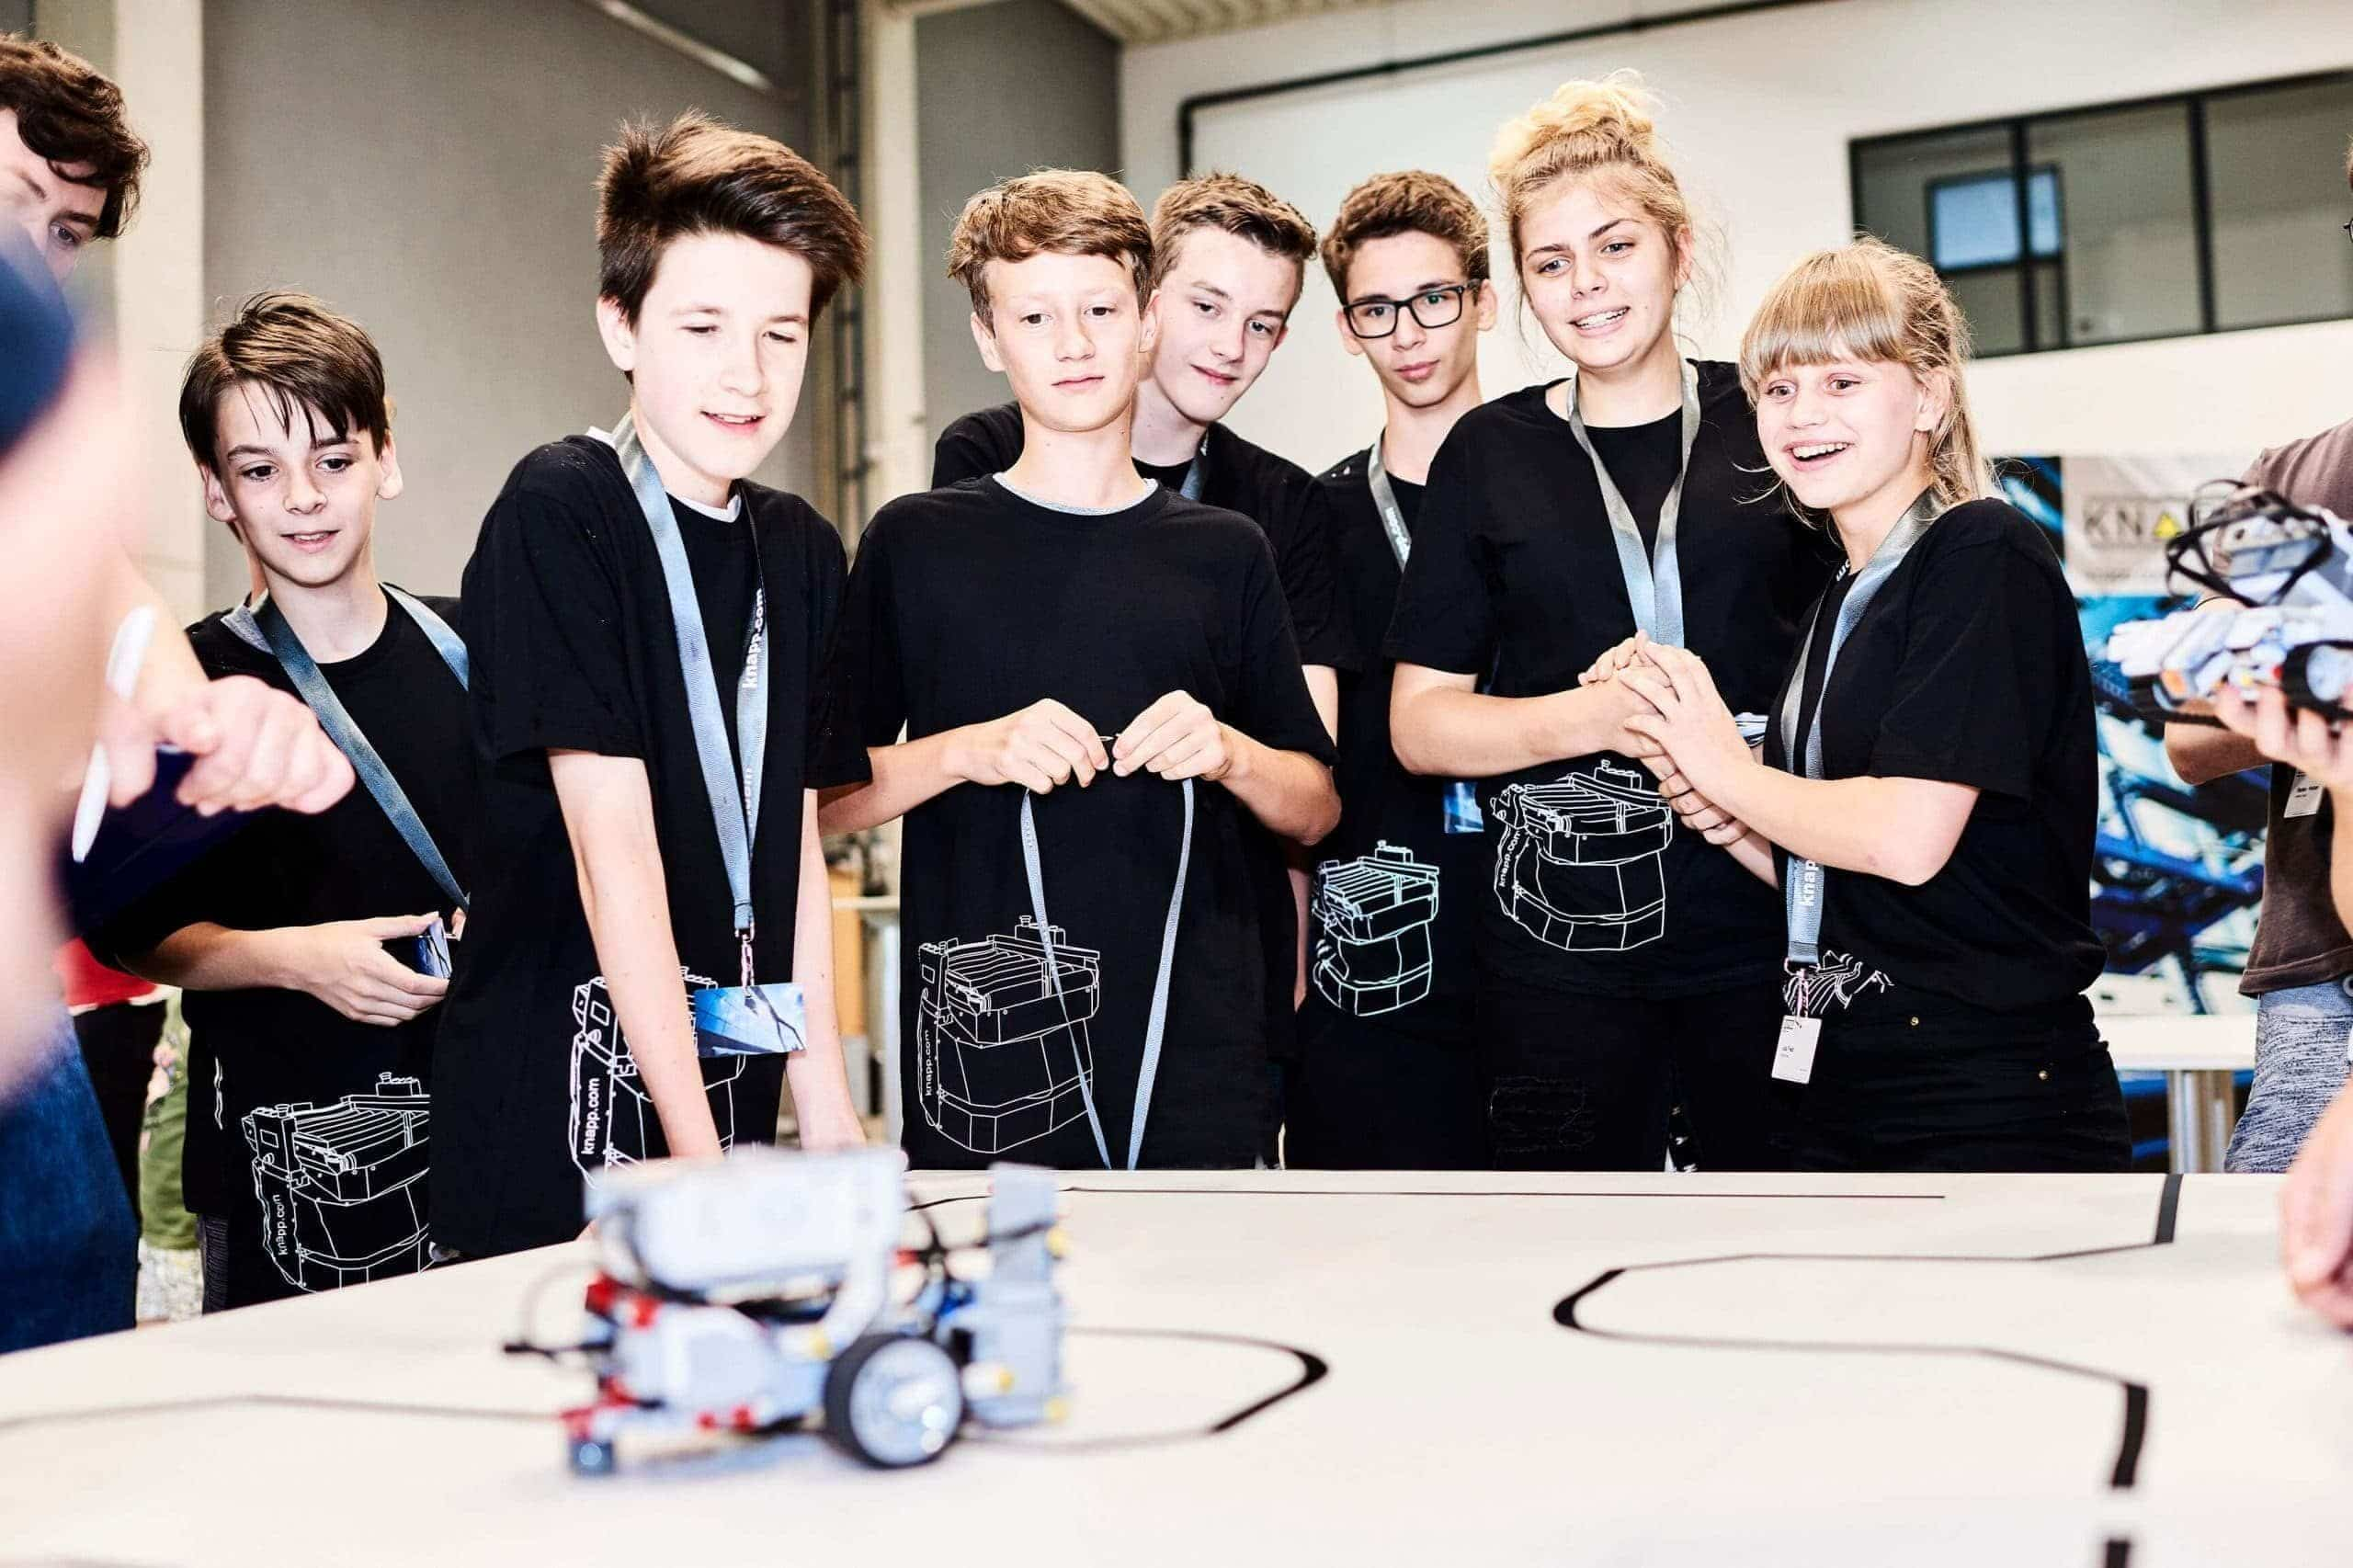 Robotik begeistert - KNAPP RoboLeague 2018